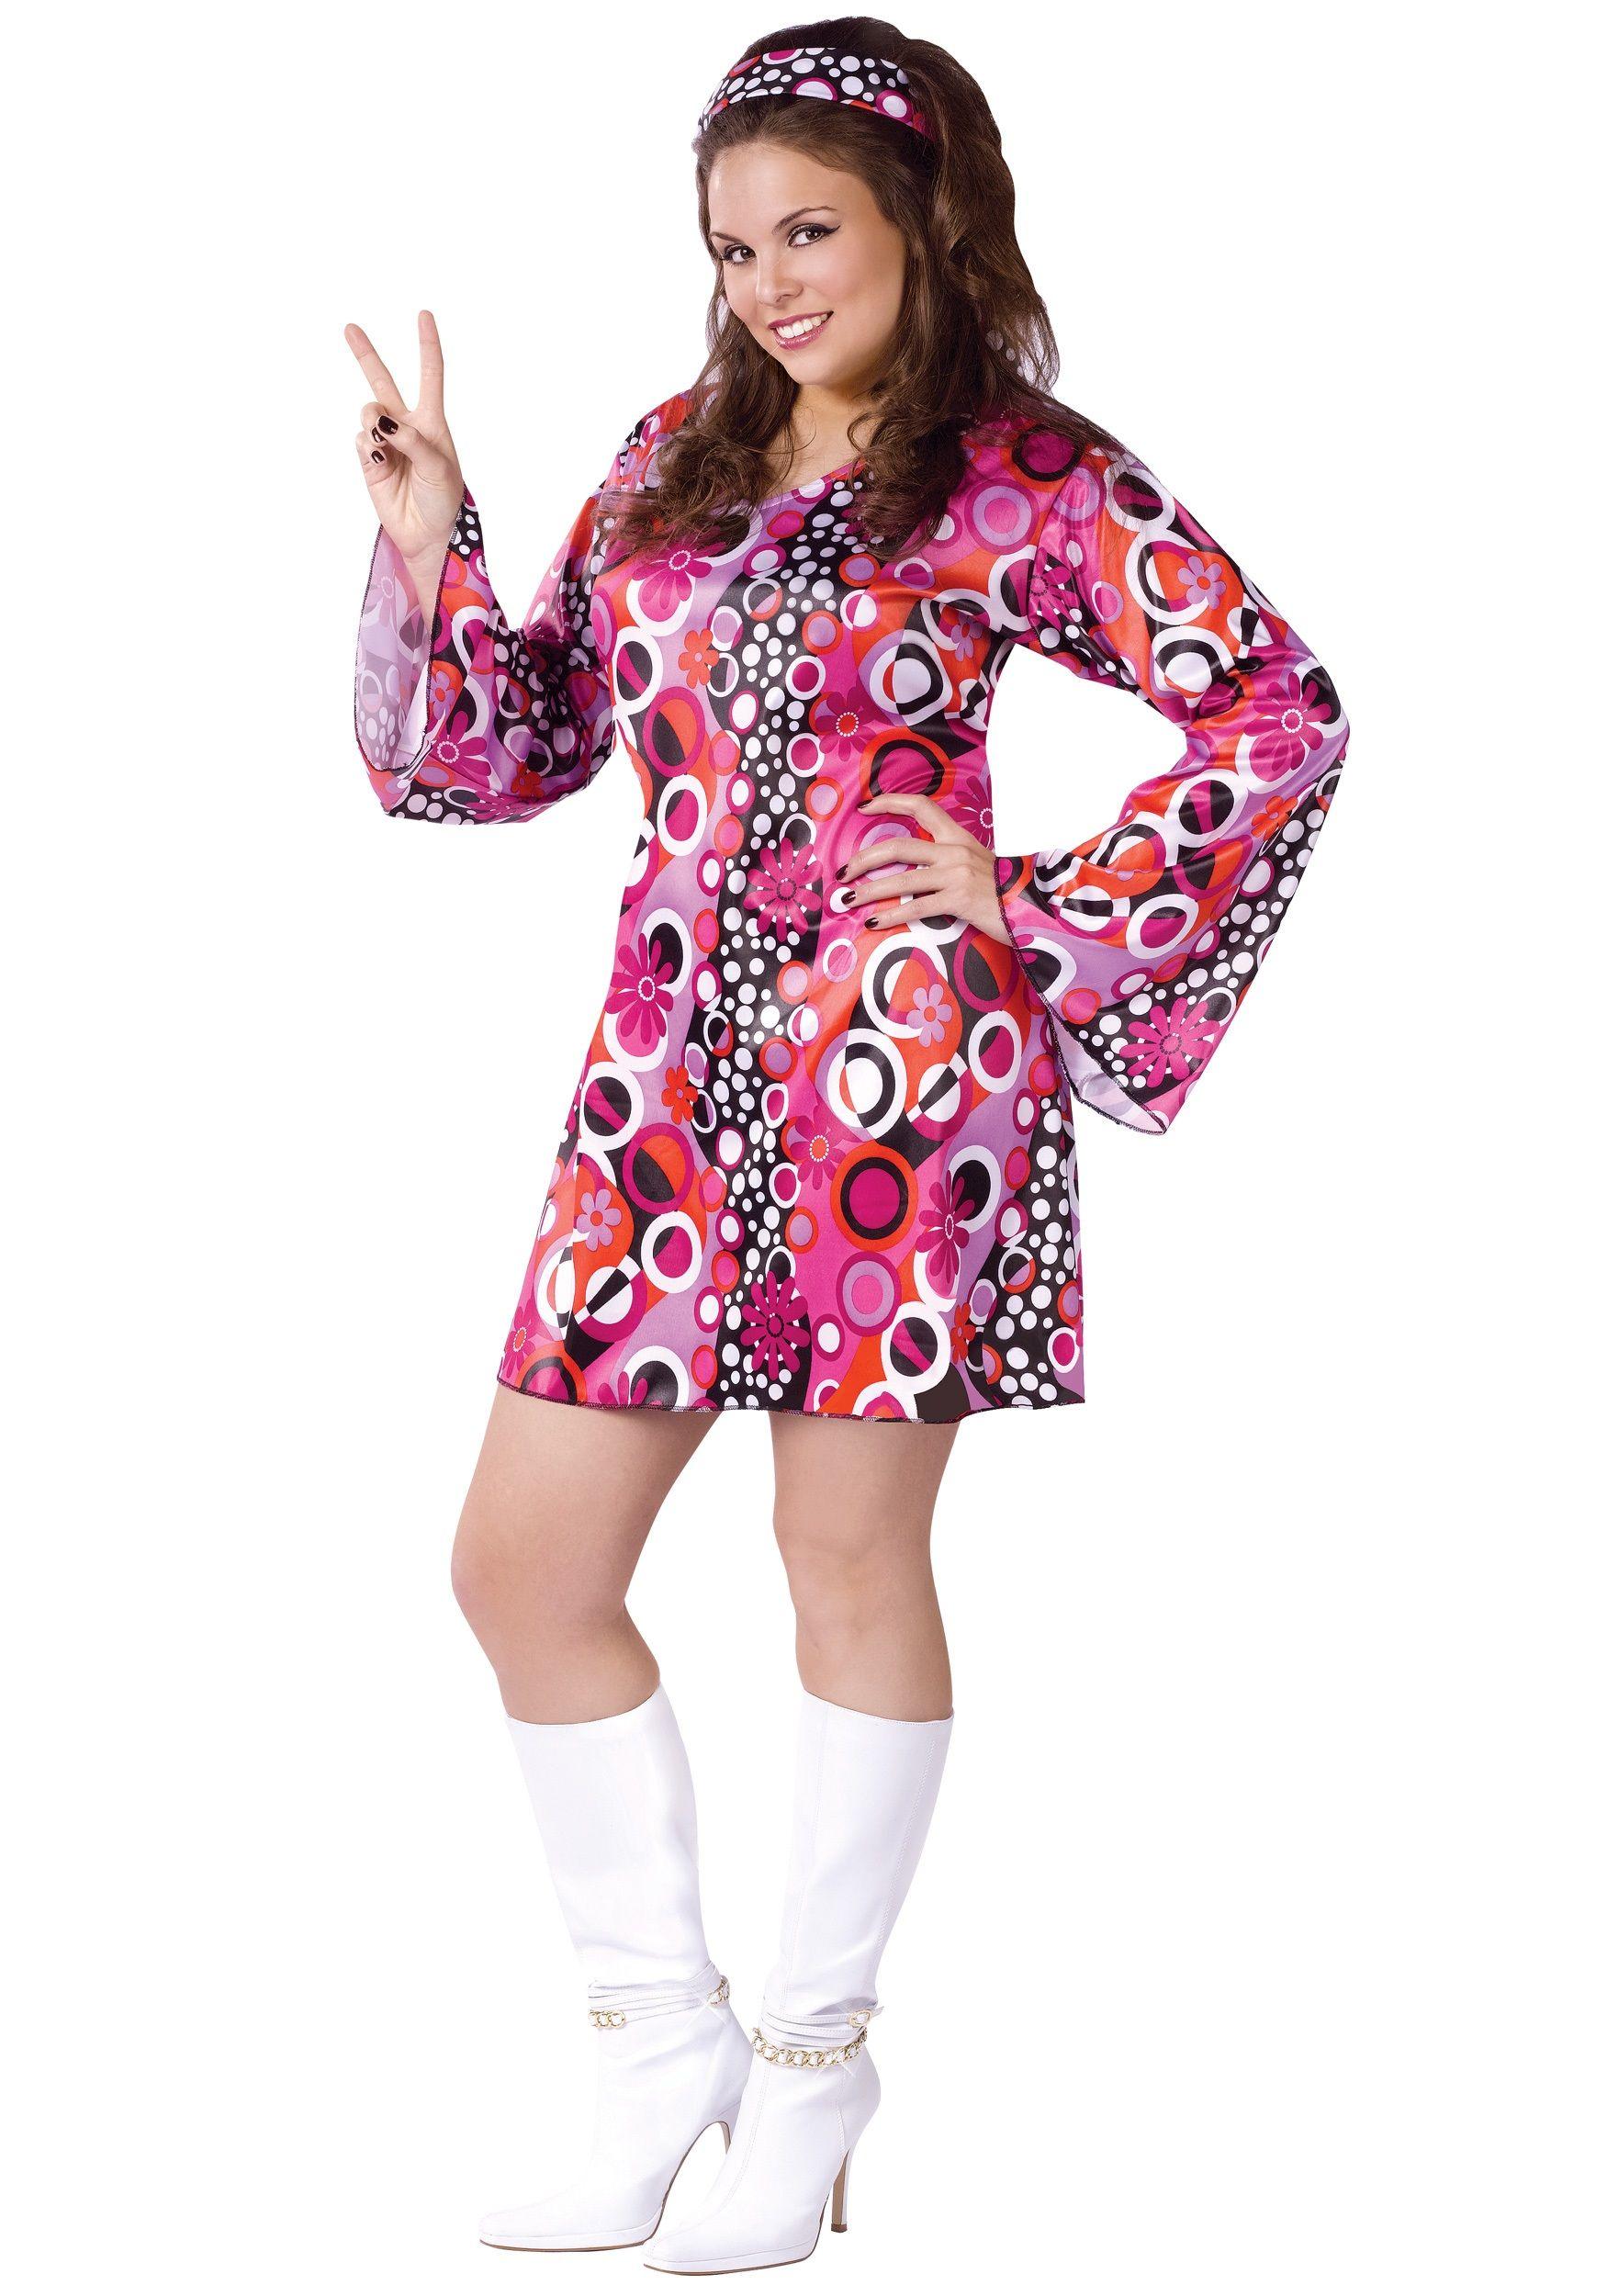 Plus Size Feelin Groovy Dress | Hippie costume and Discos